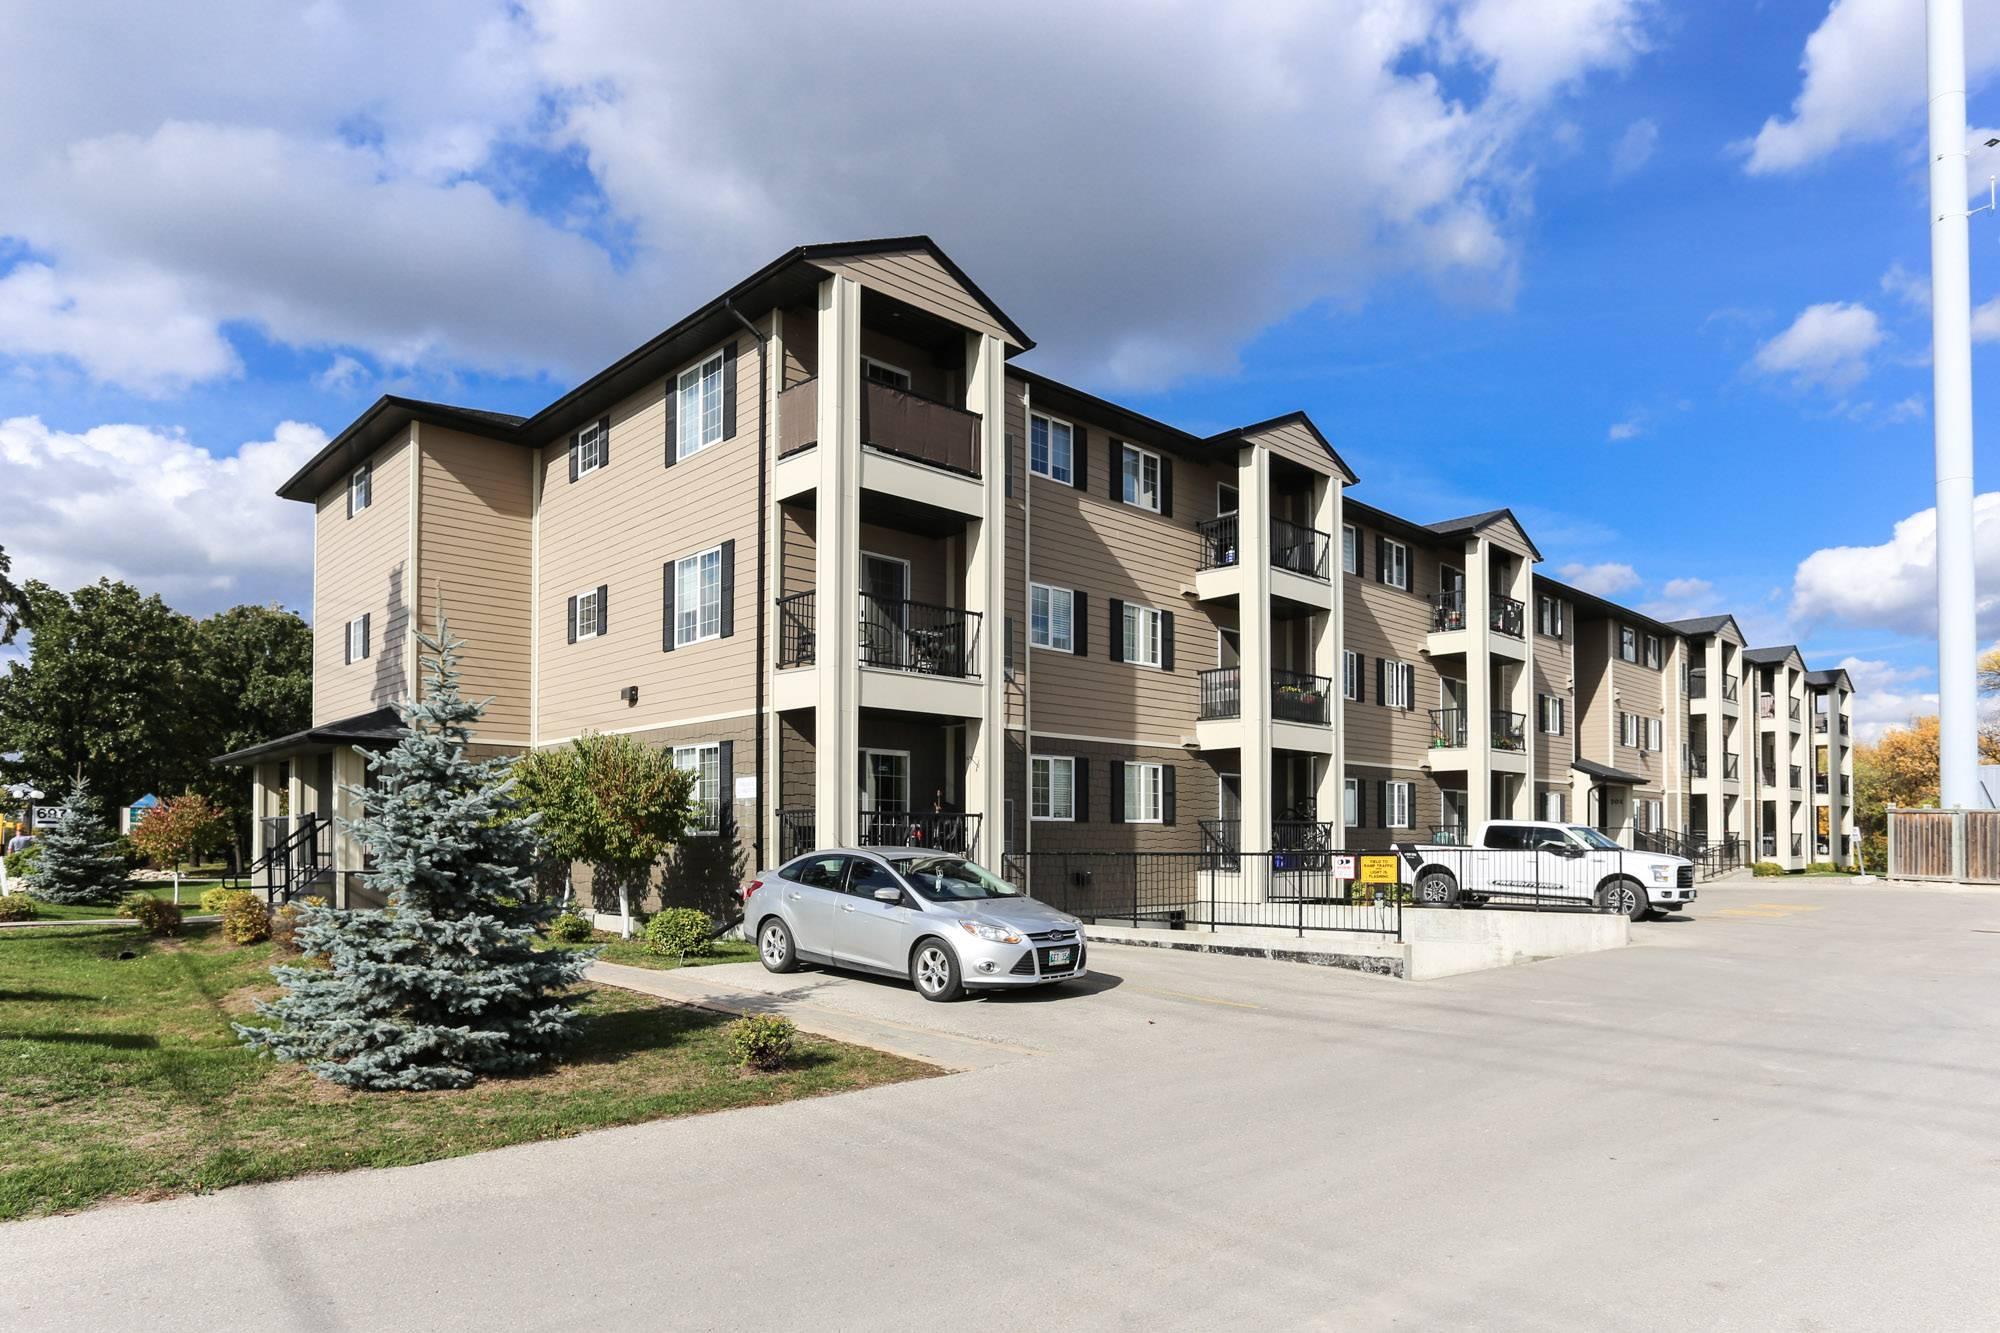 336-701 St Annes, Winnipeg, Manitoba  R2M 3B3 - Photo 28 - 1825923